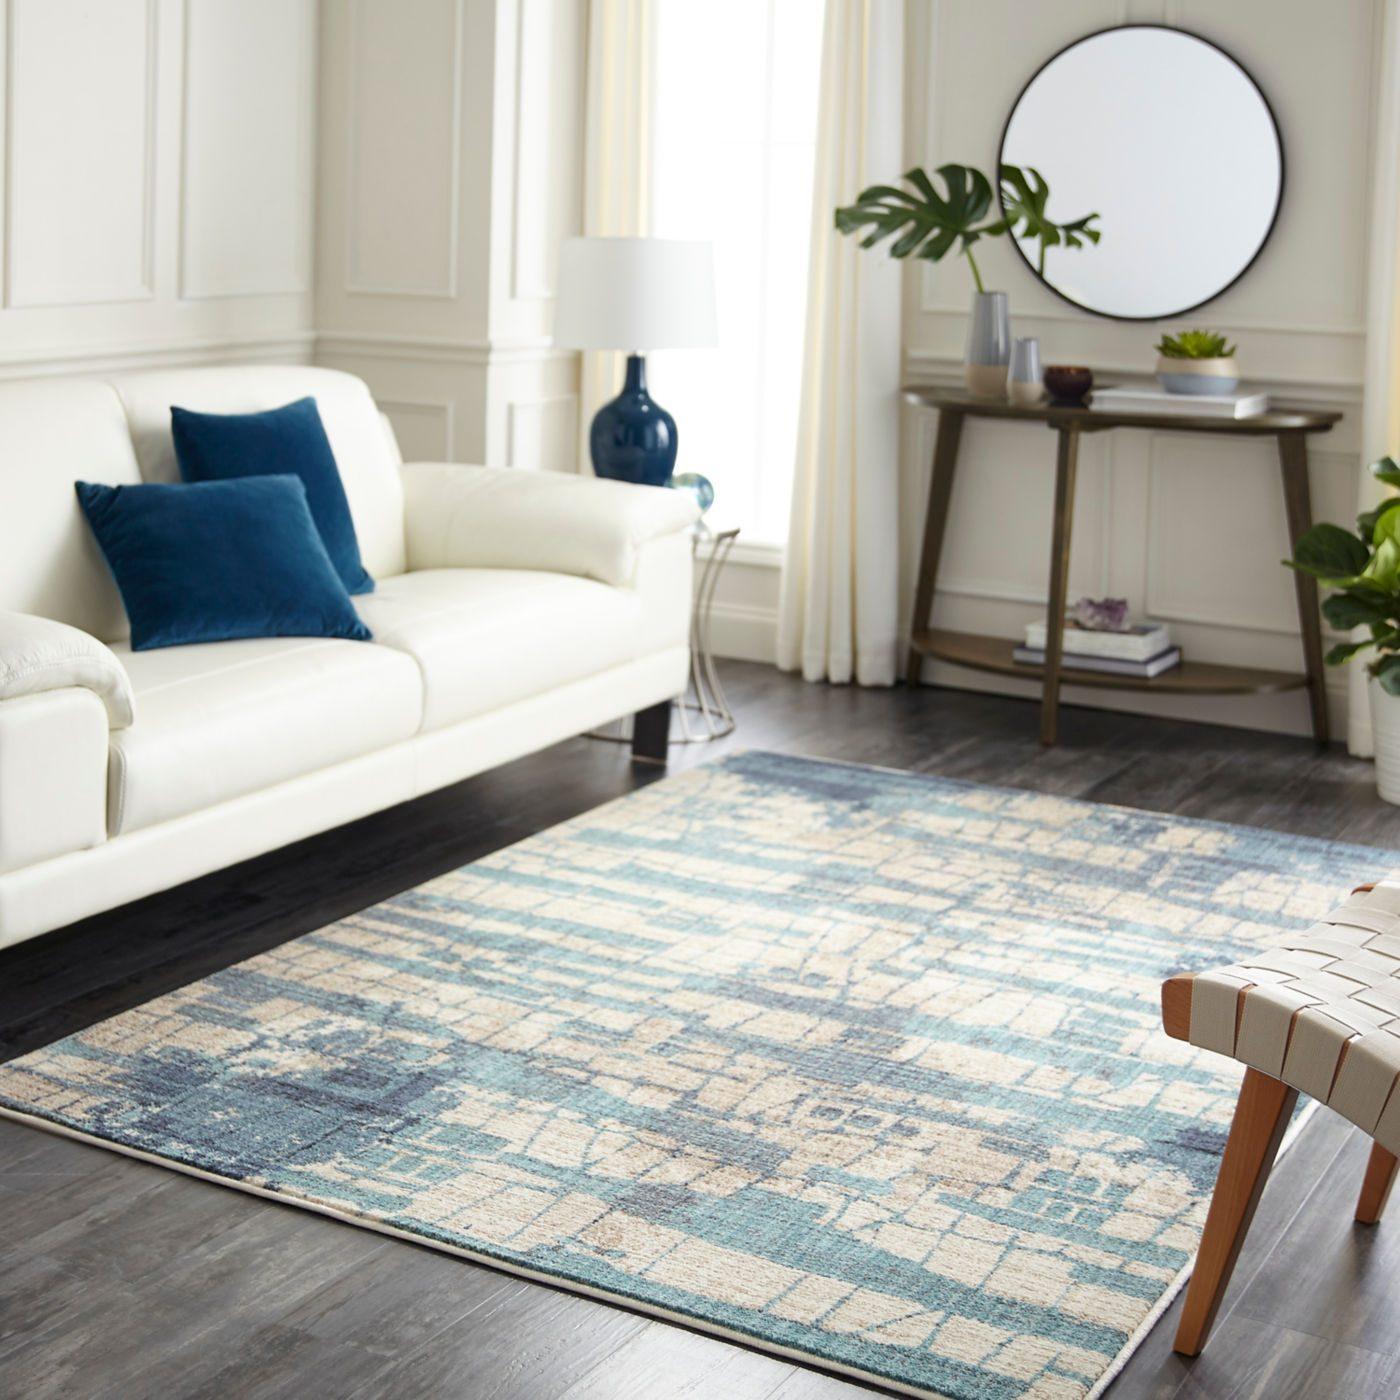 Karastan area rug | McCool's Flooring